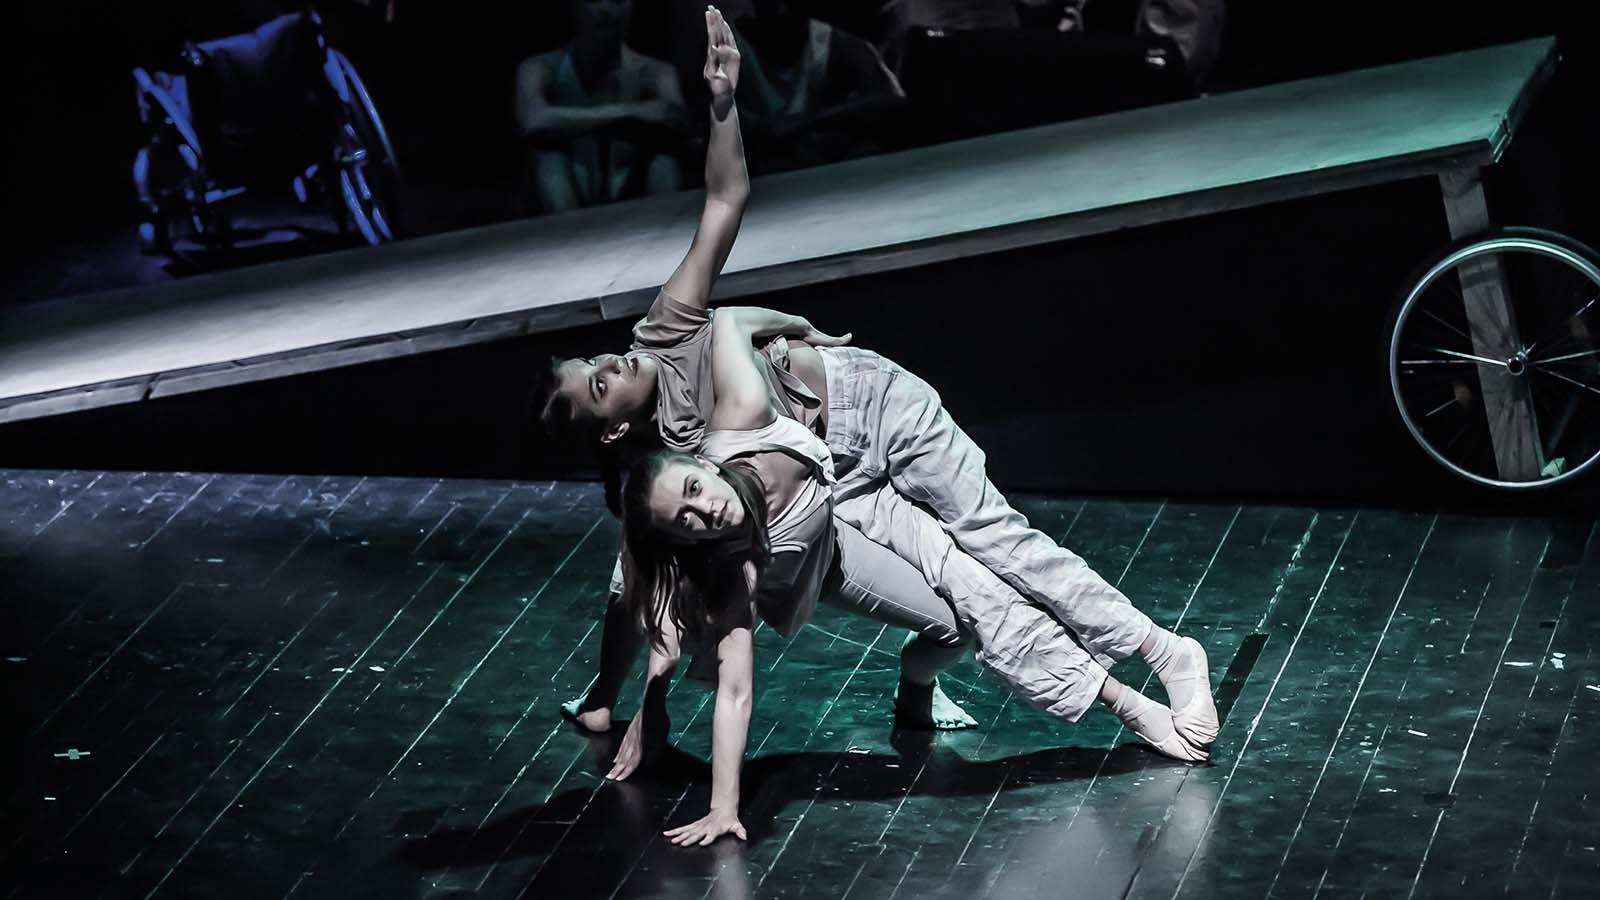 L-Performance / Photo: Yilmaz Ulus